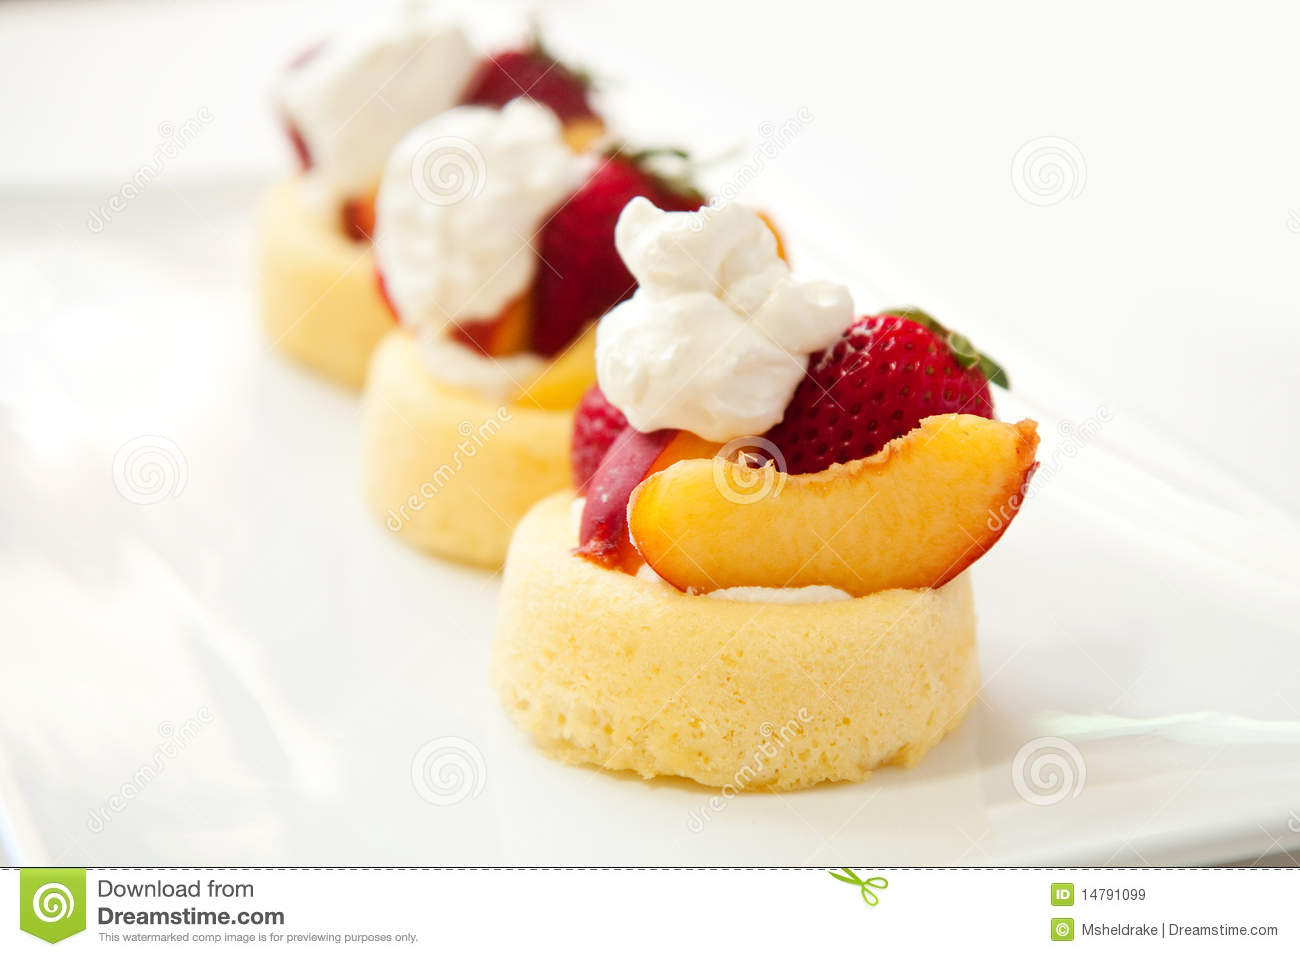 Easy Summer Fruit Desserts  Simple Summer Fruit Dessert Royalty Free Stock